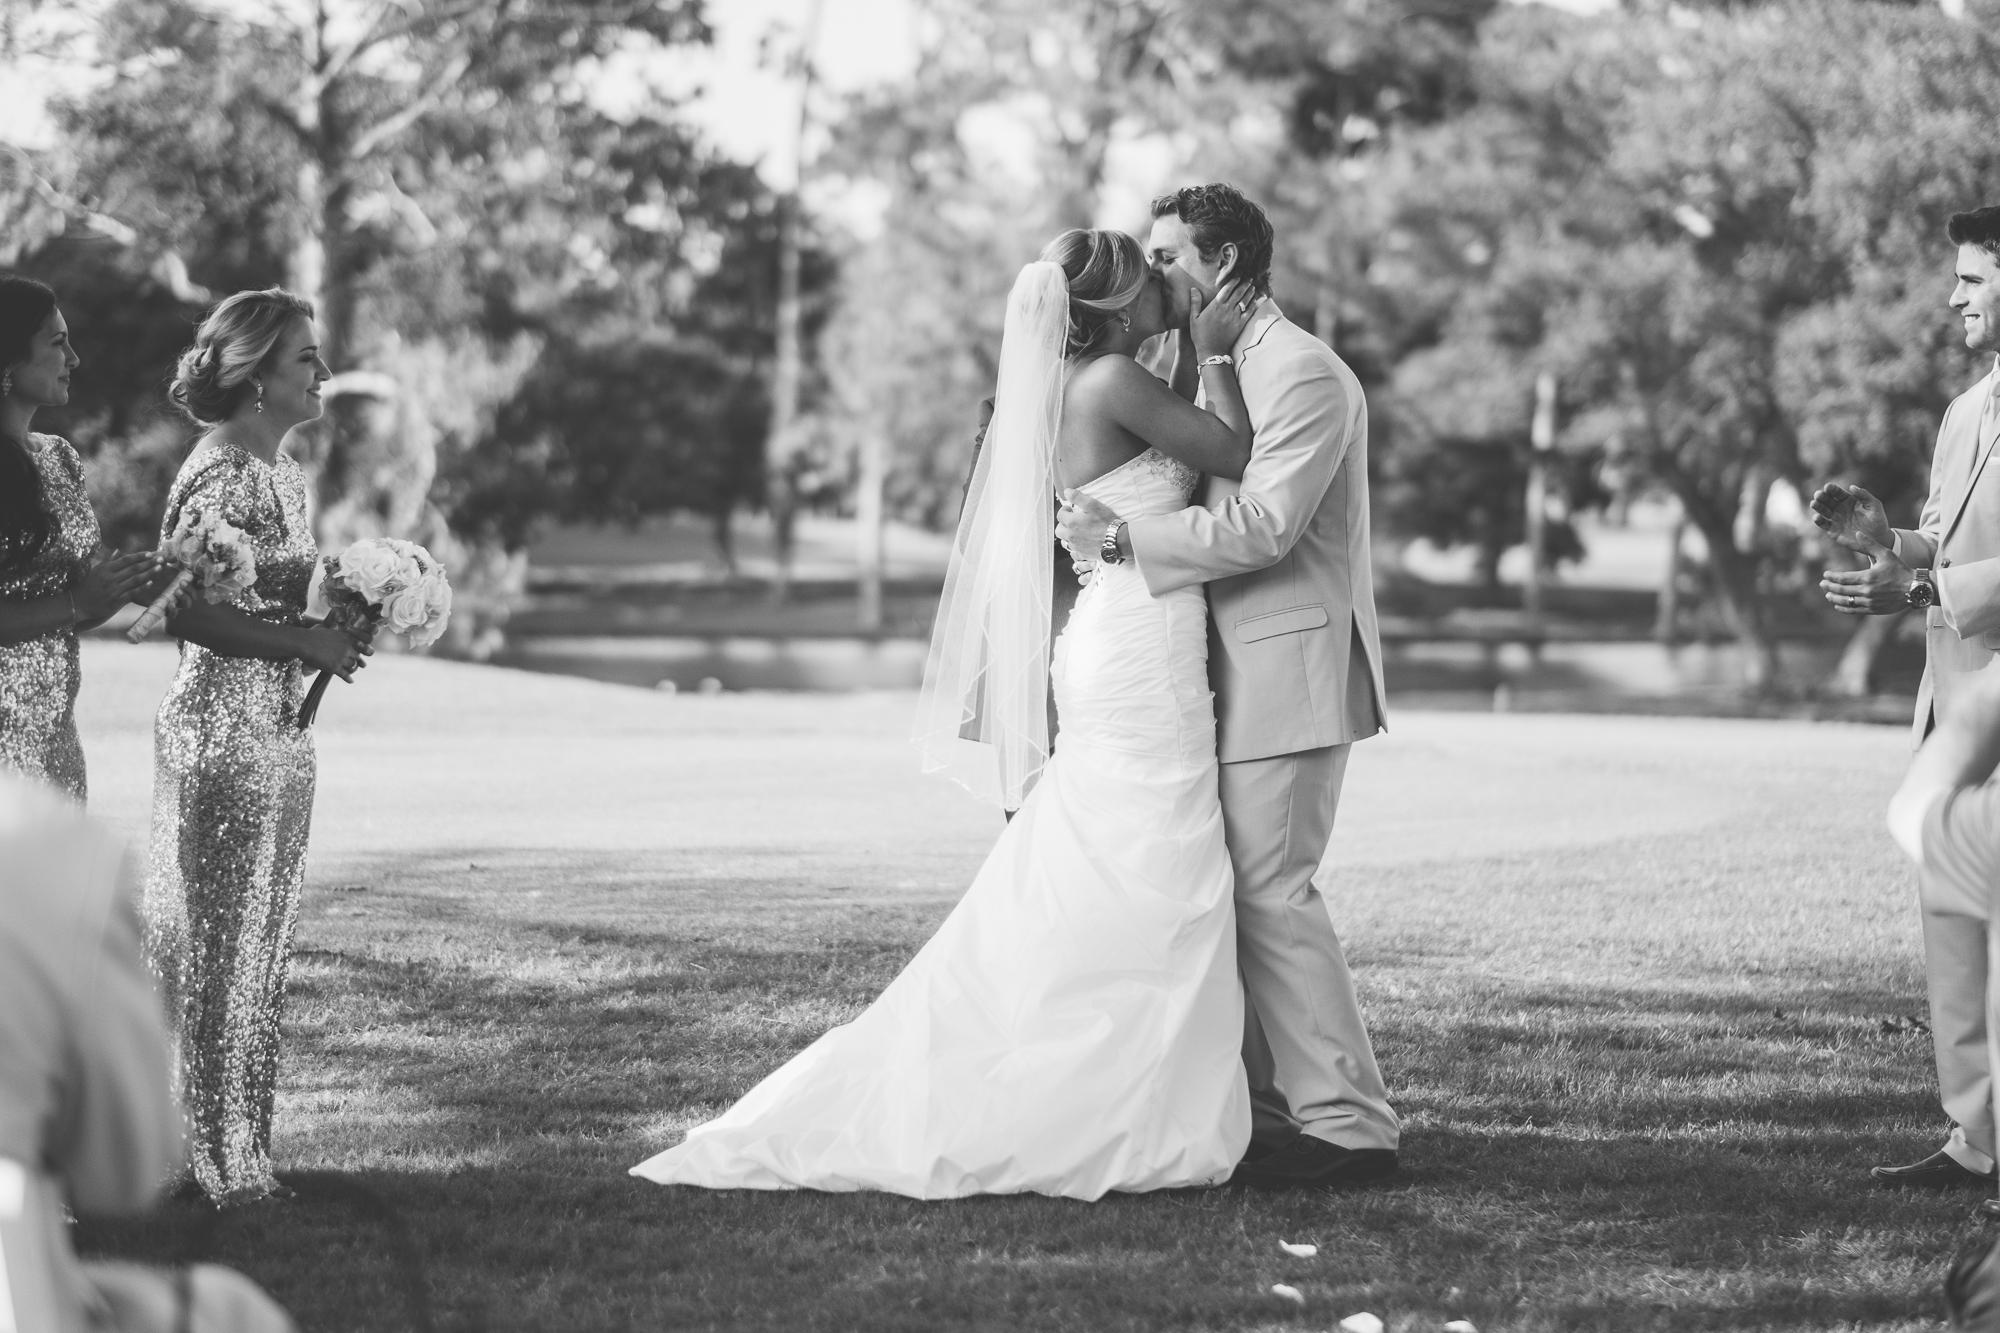 Heather-Chris-wedding-blog-21.jpg